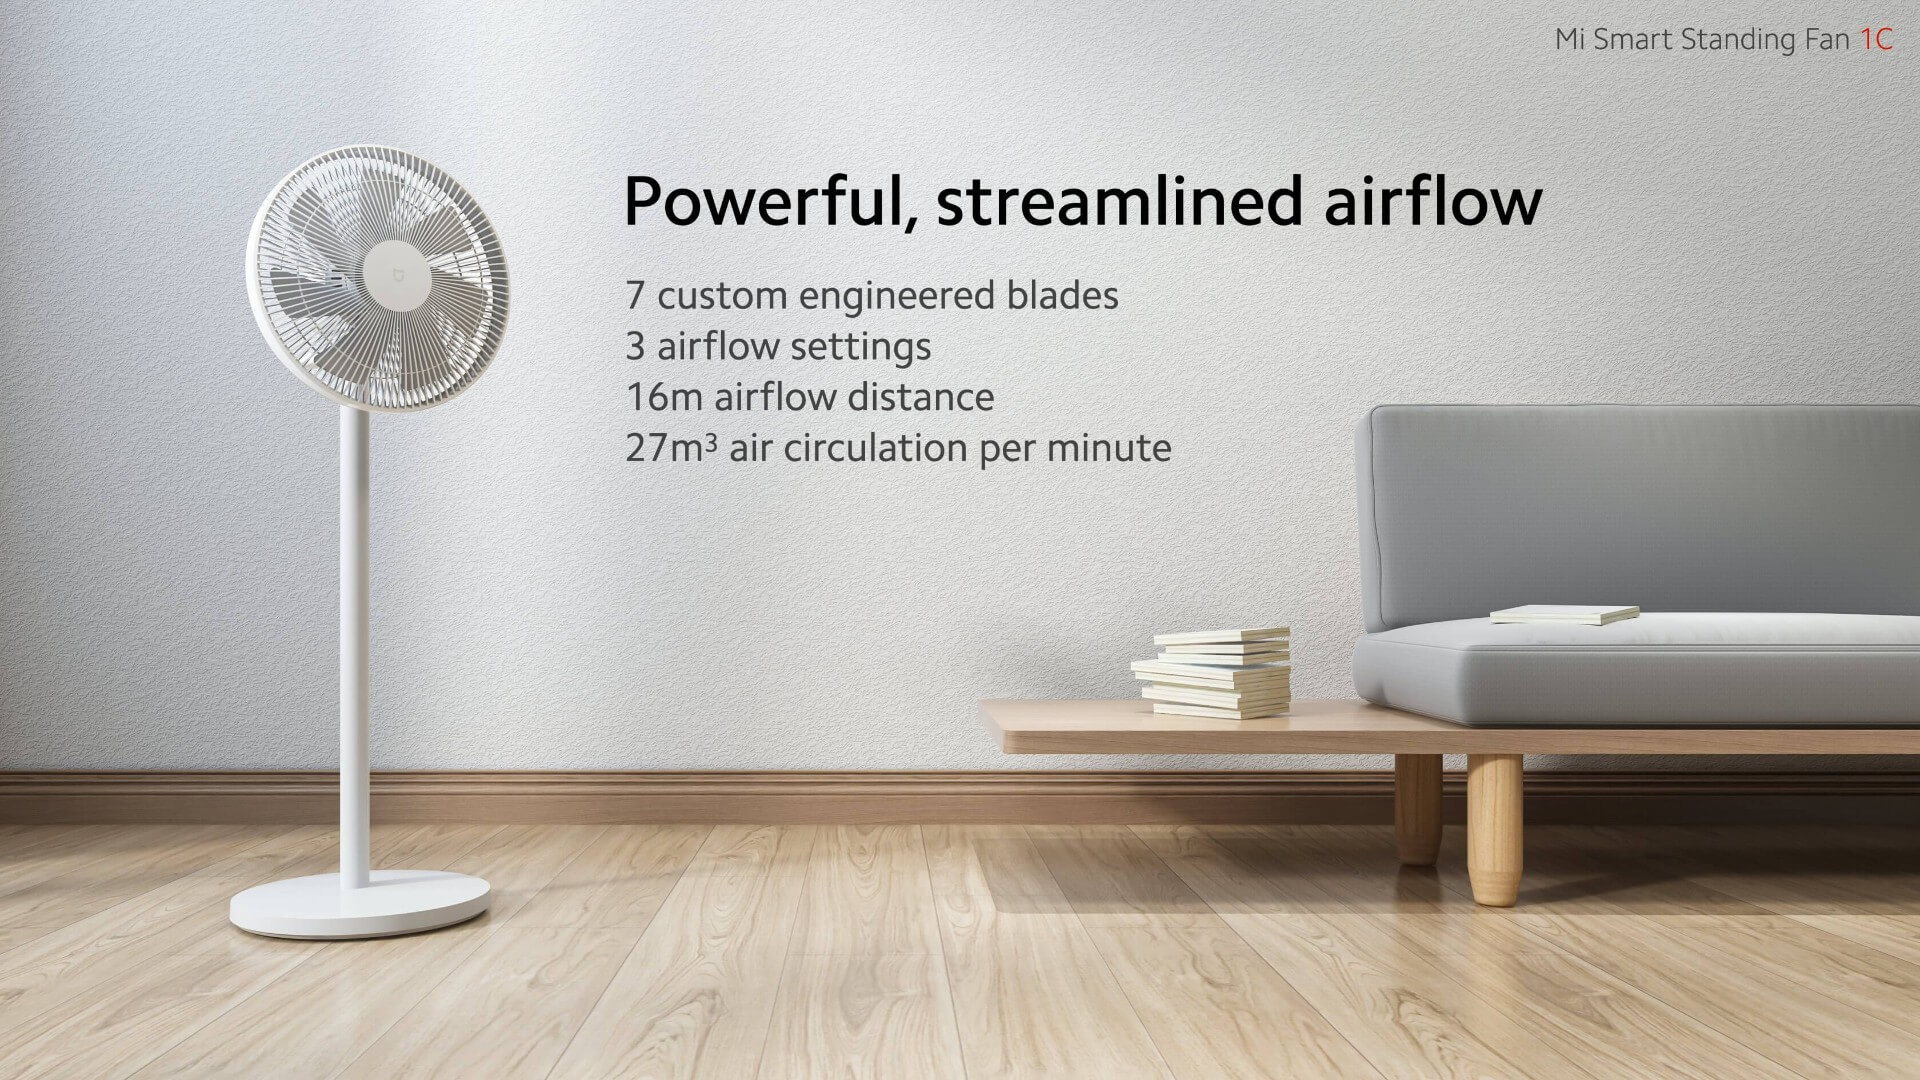 Xiaomi Mi Smart Standing Fan 1C already on sale: Coupon in Europe